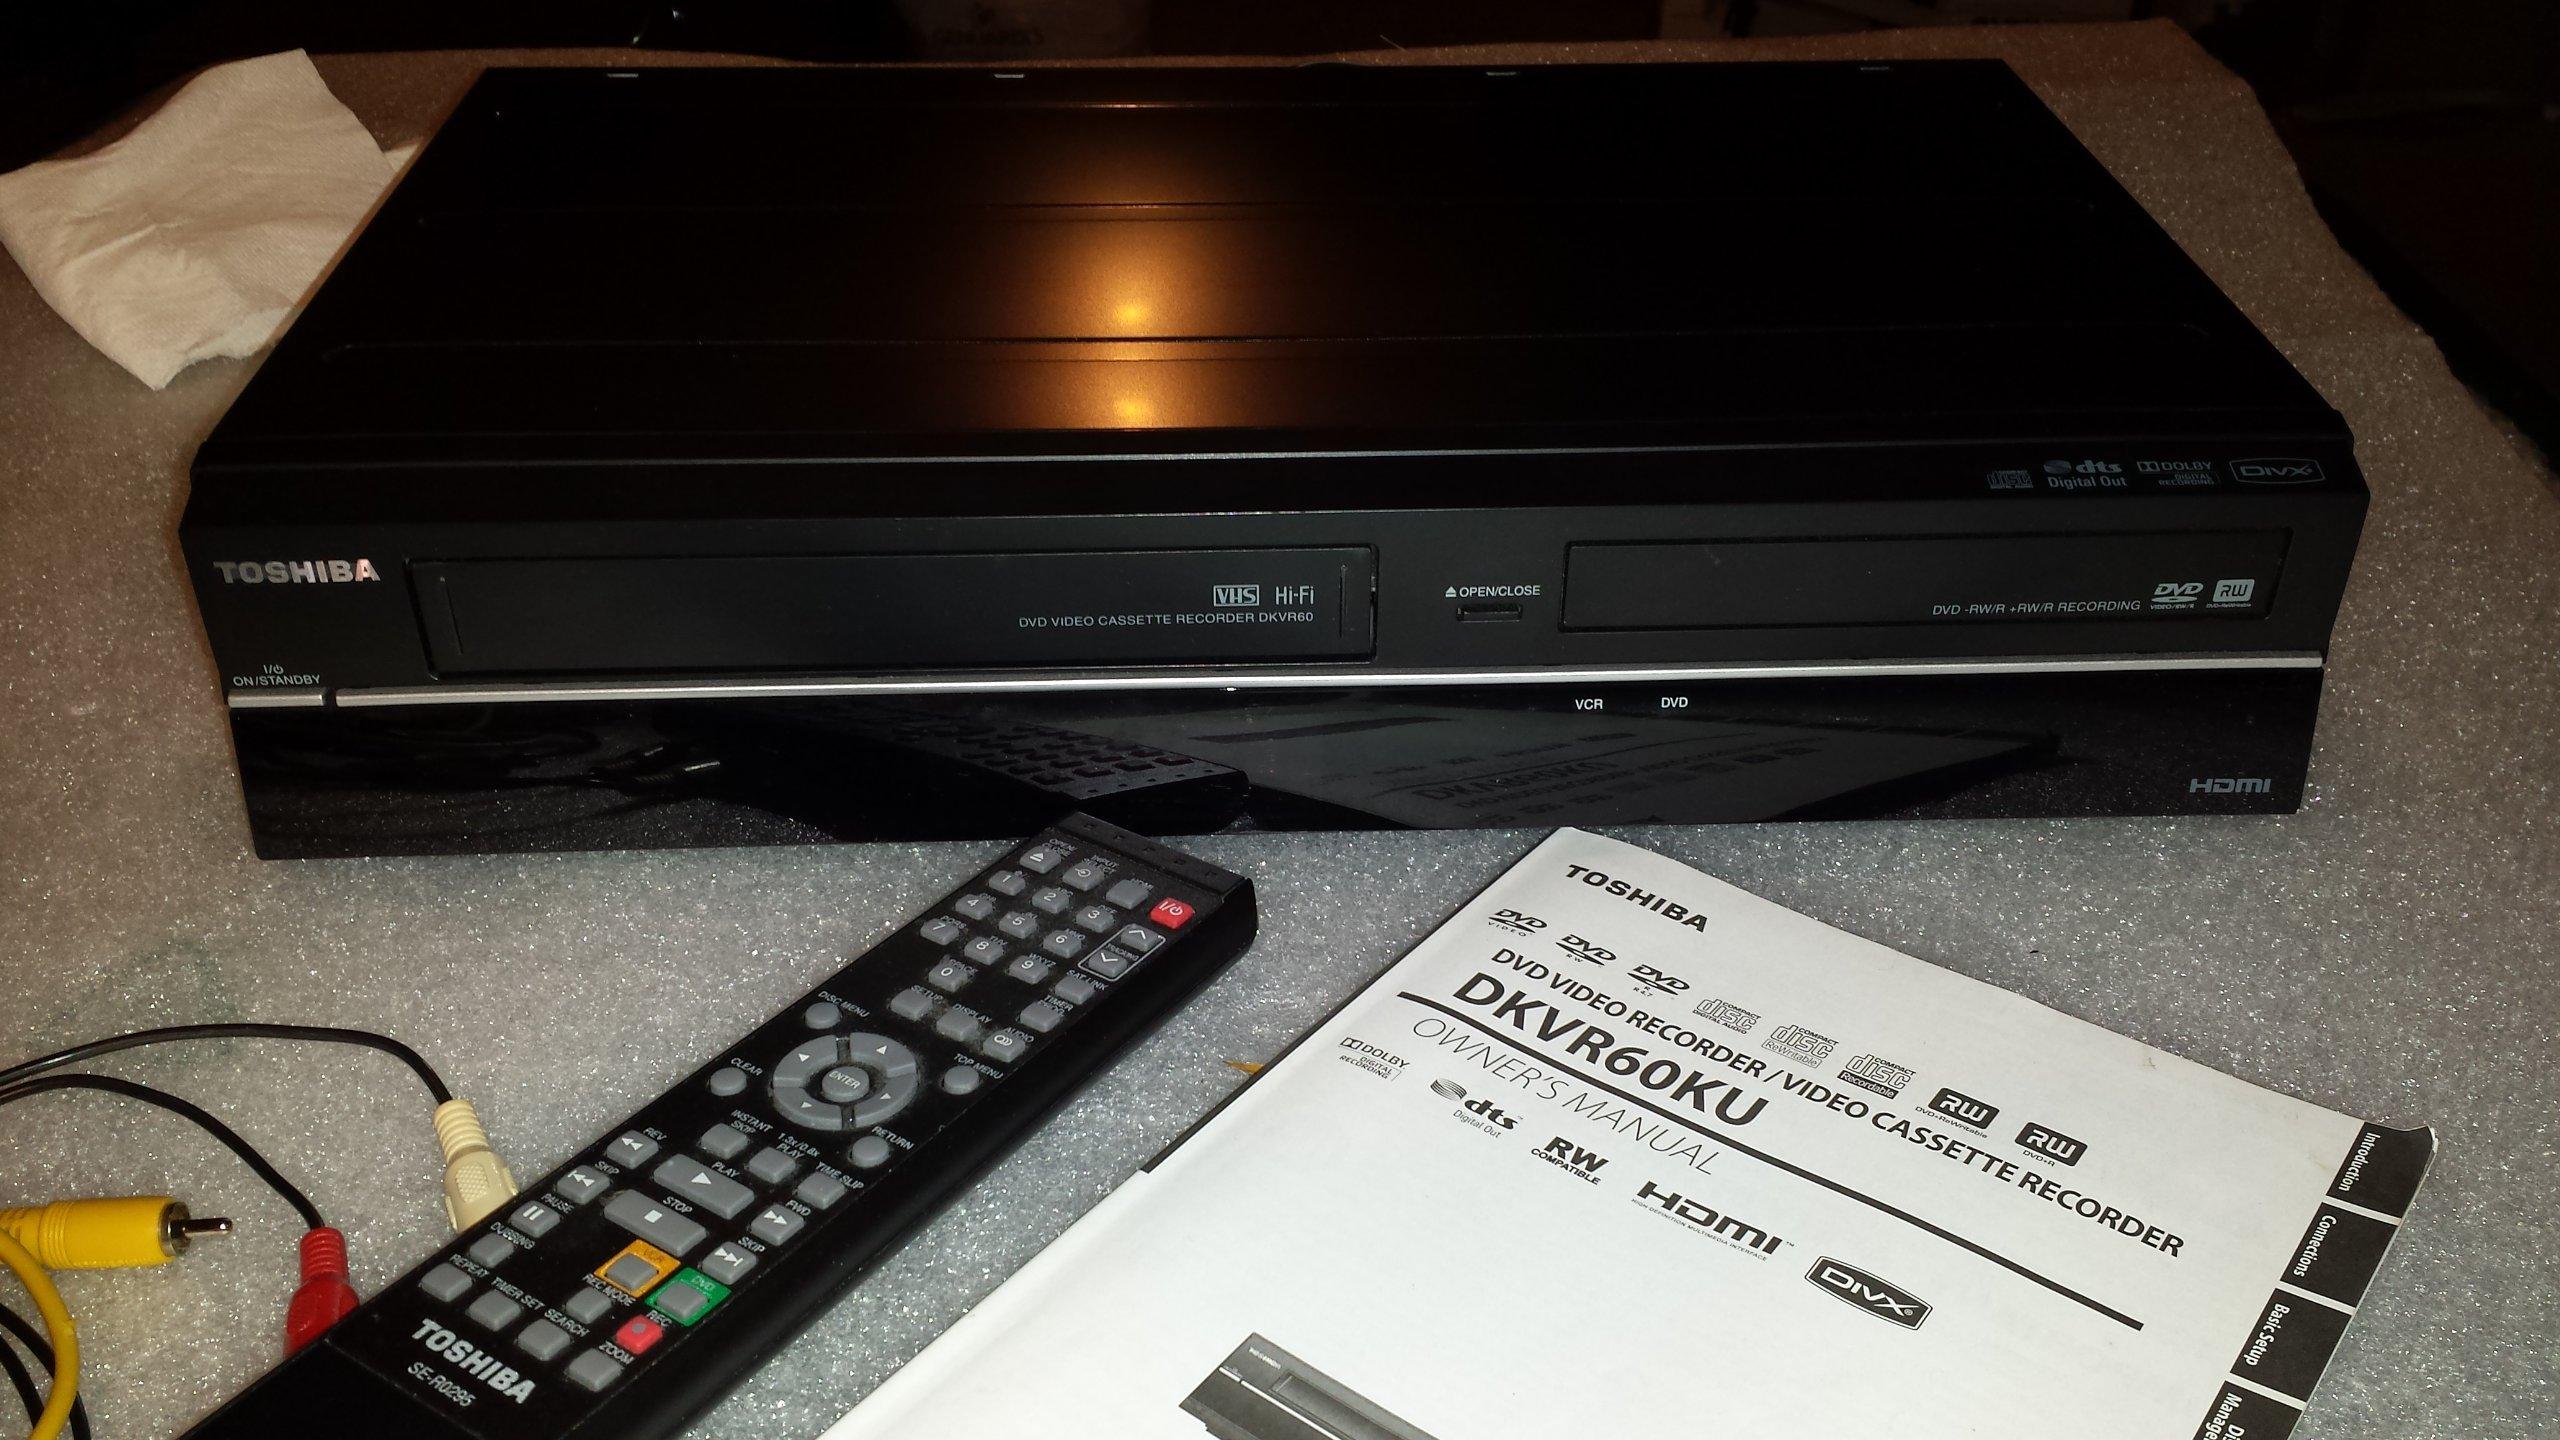 cheap toshiba vcr dvd find toshiba vcr dvd deals on line at alibaba com rh guide alibaba com toshiba dvd video cassette recorder dvr670 manual toshiba dvd video cassette recorder dvr7 manual